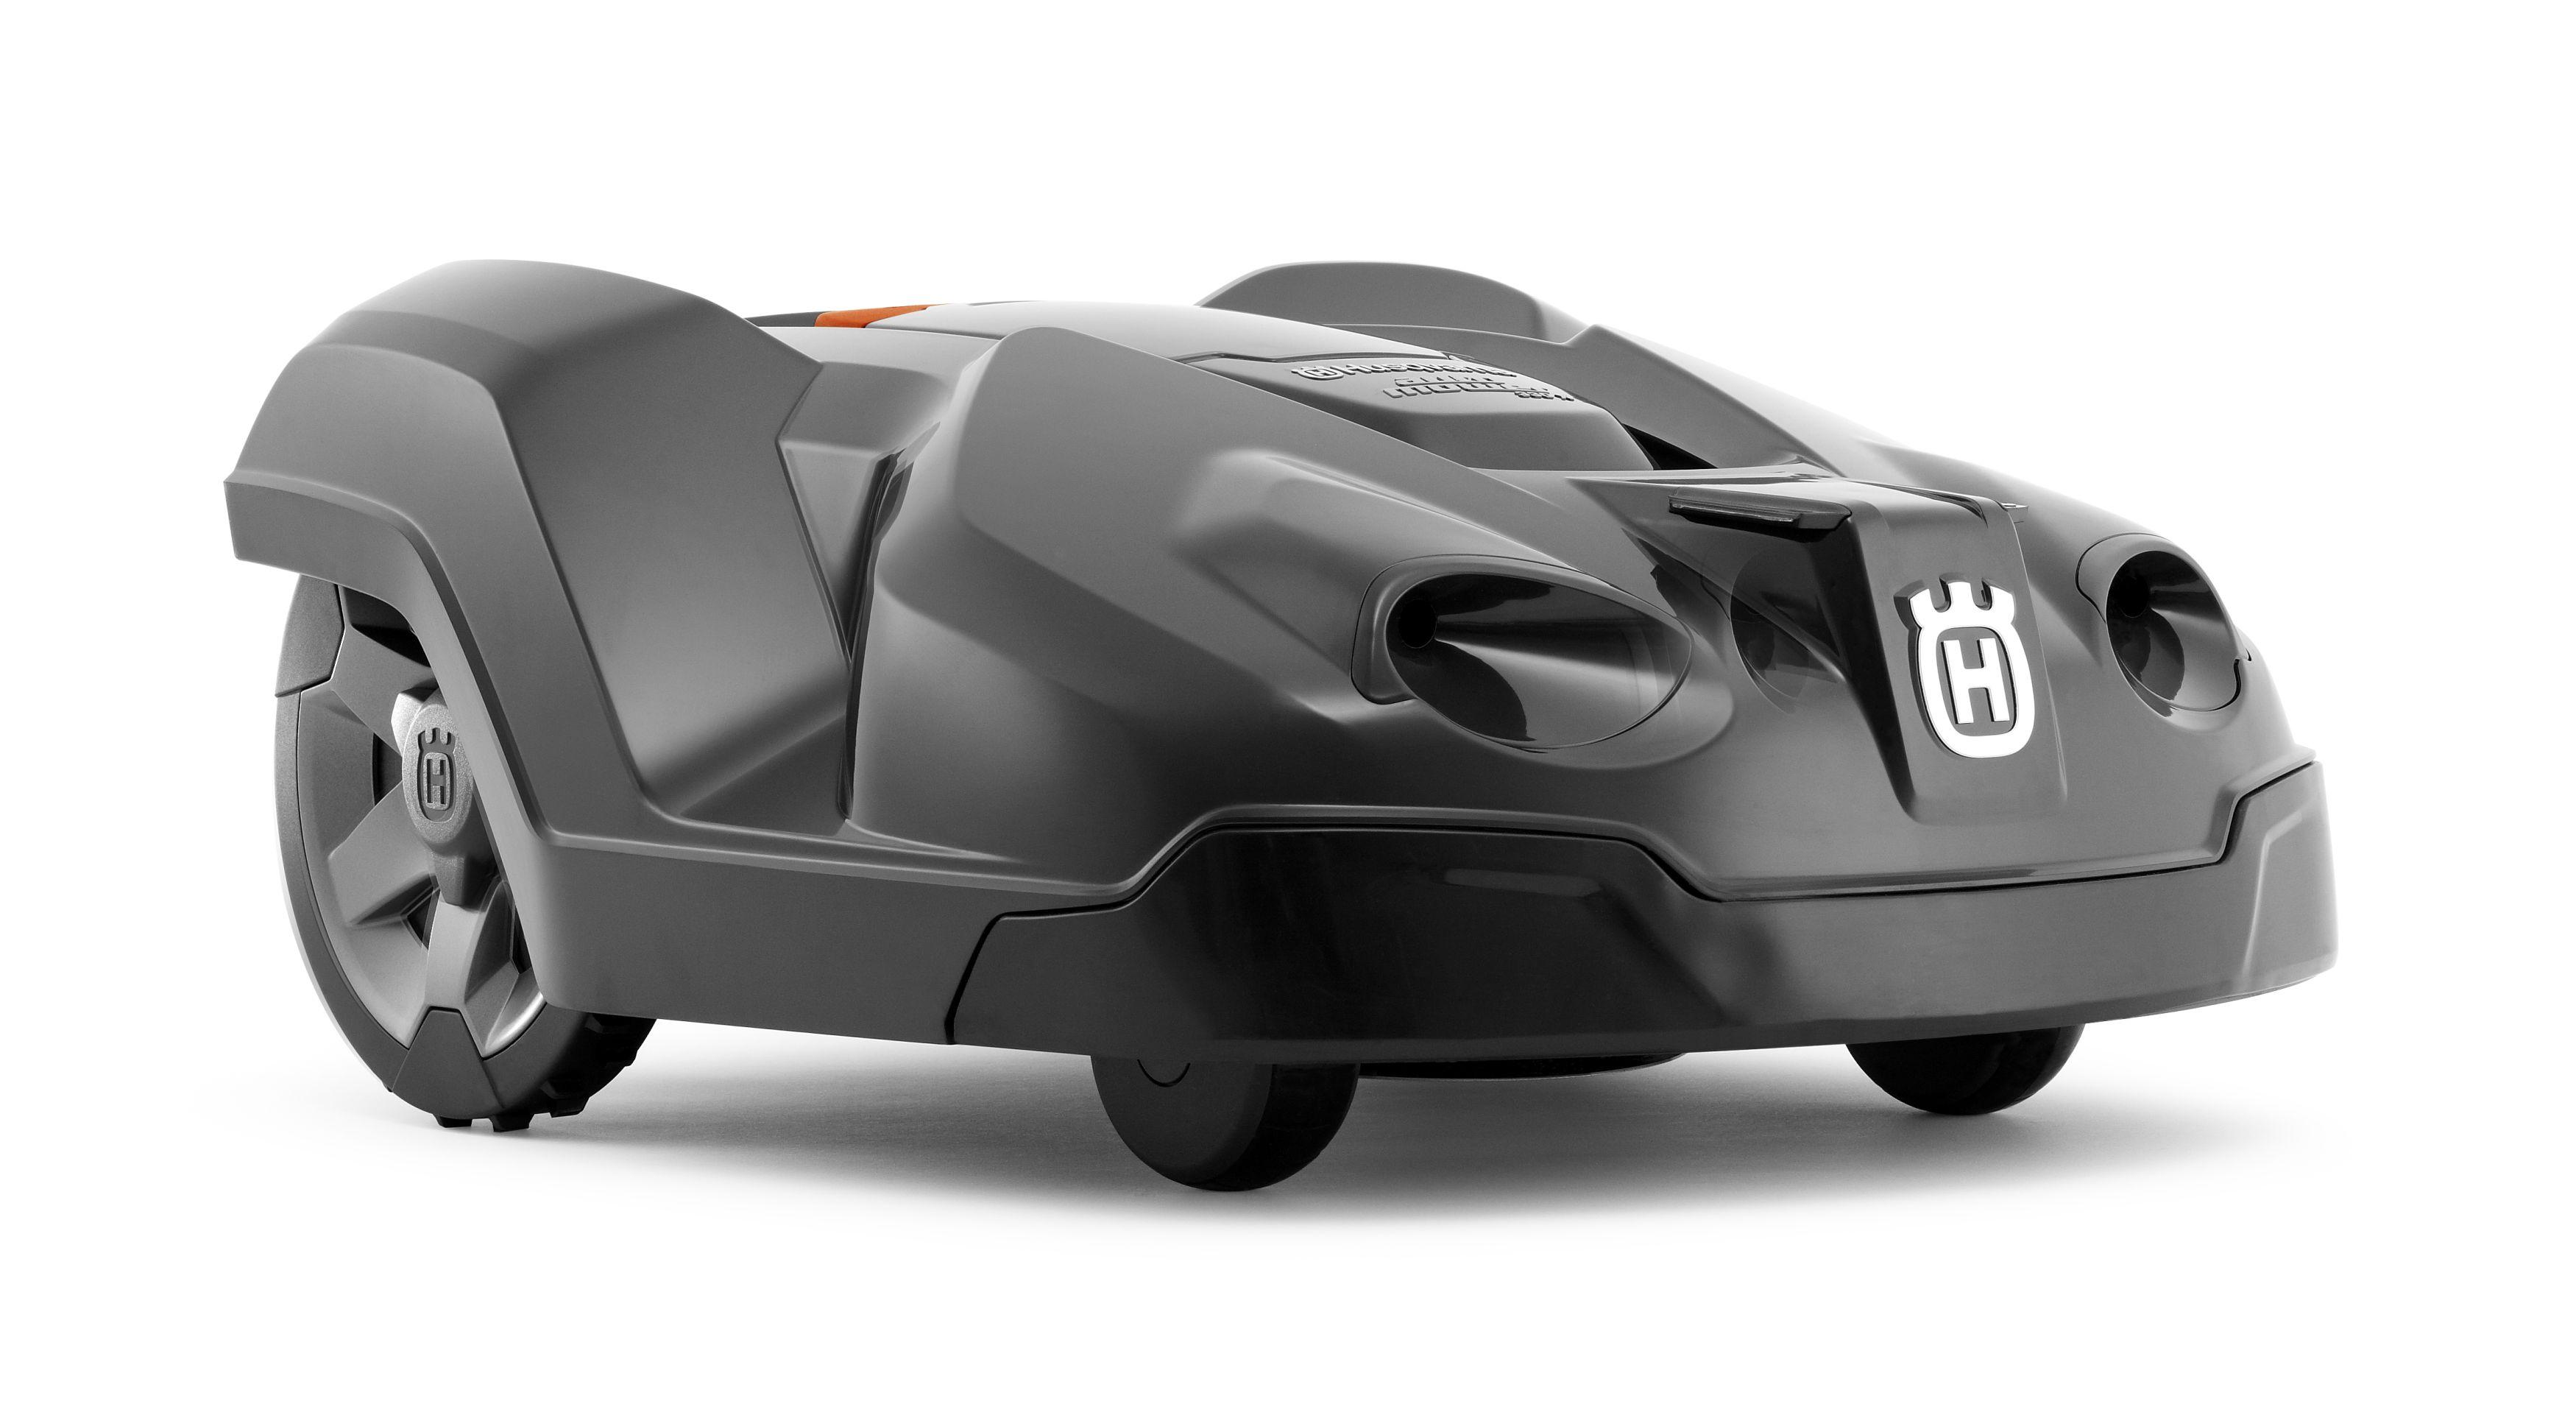 husqvarna automower 330x awarded best premium robotic mower design buy build. Black Bedroom Furniture Sets. Home Design Ideas